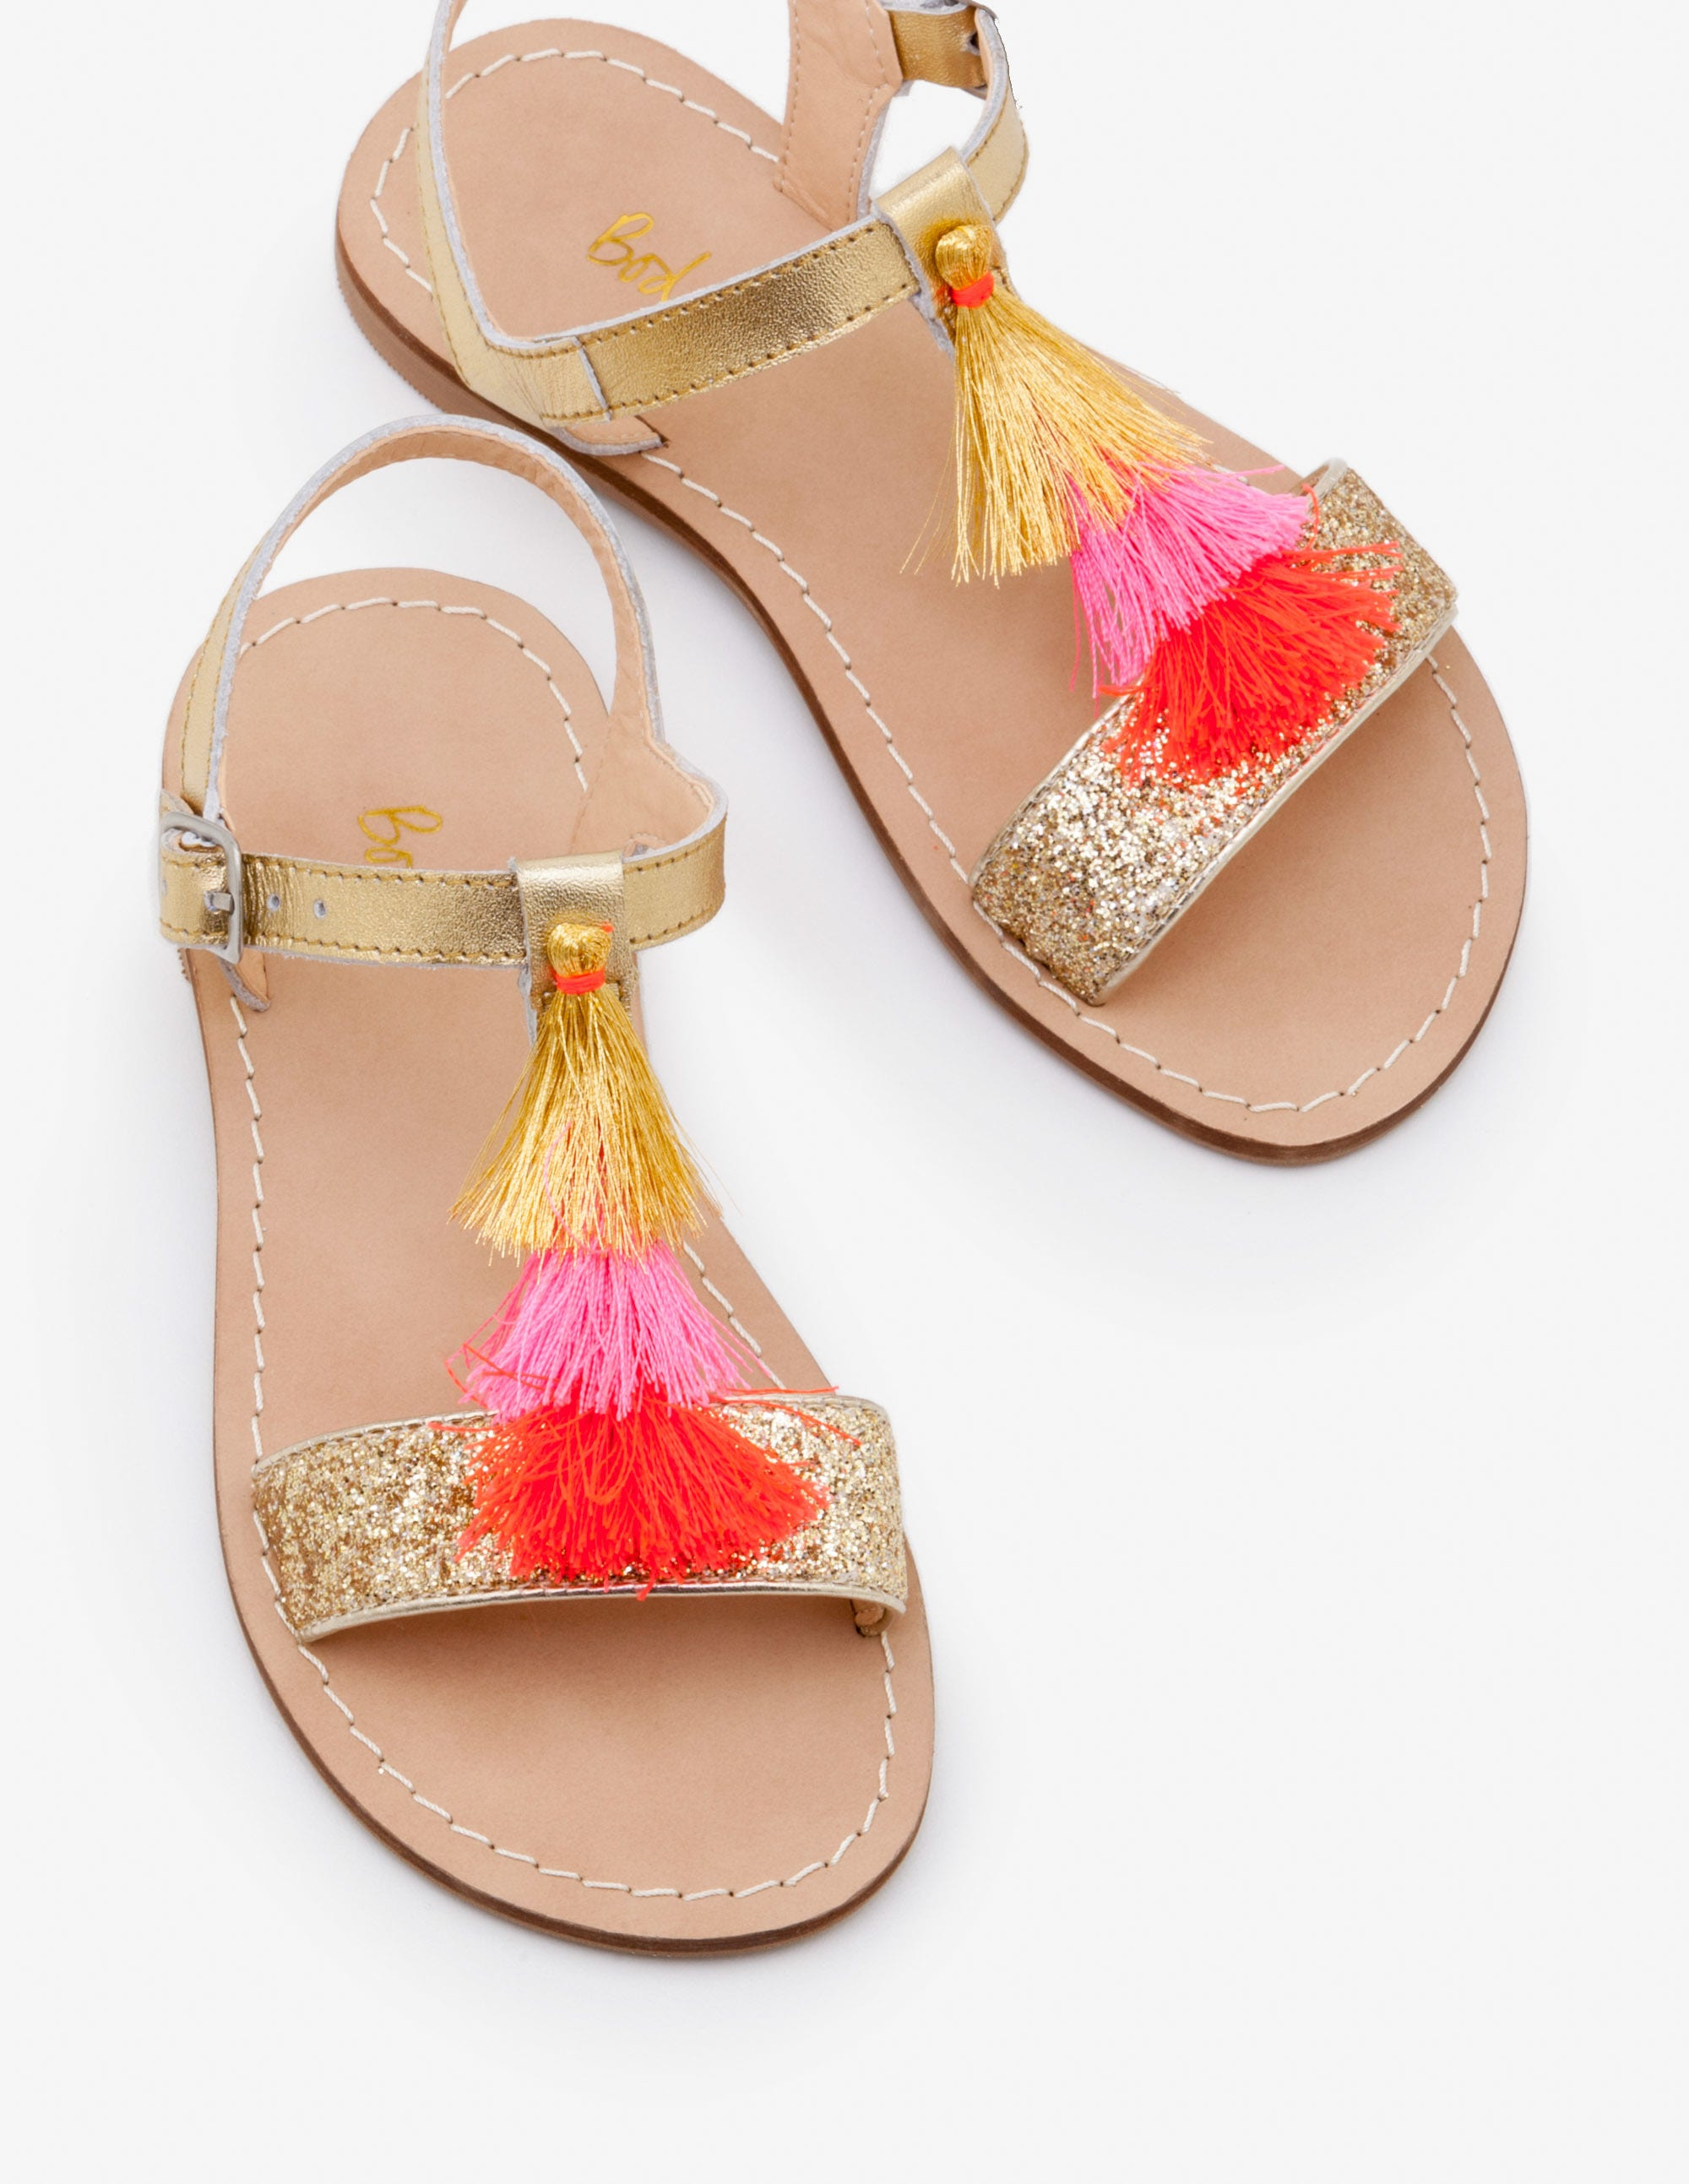 Tassel Sandals - Gold Metallic | Boden UK